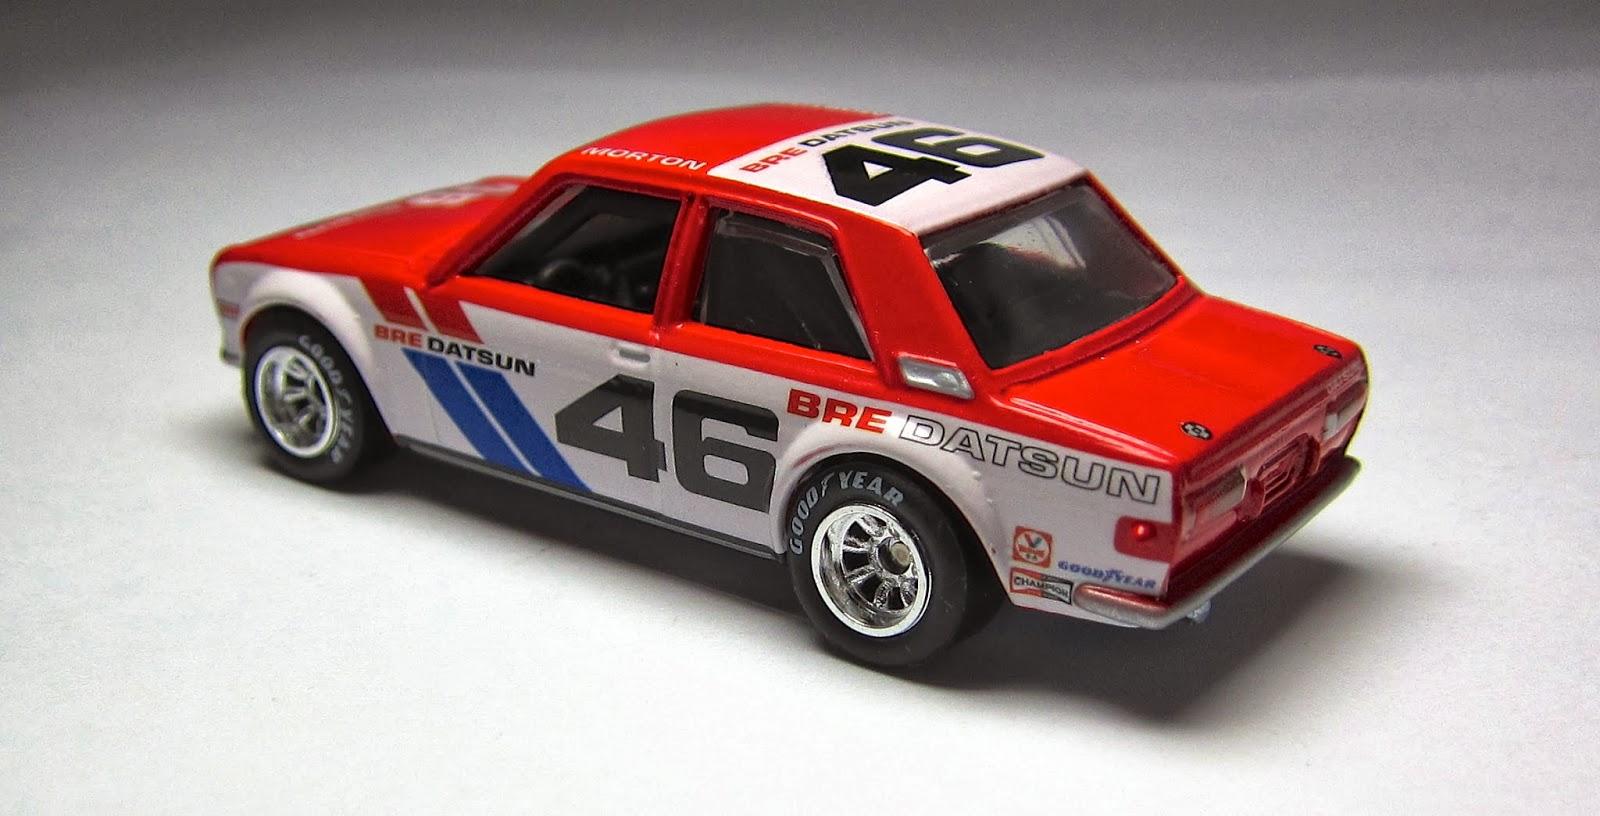 Model of the Day: Hot Wheels Vintage Racing John Morton's ...